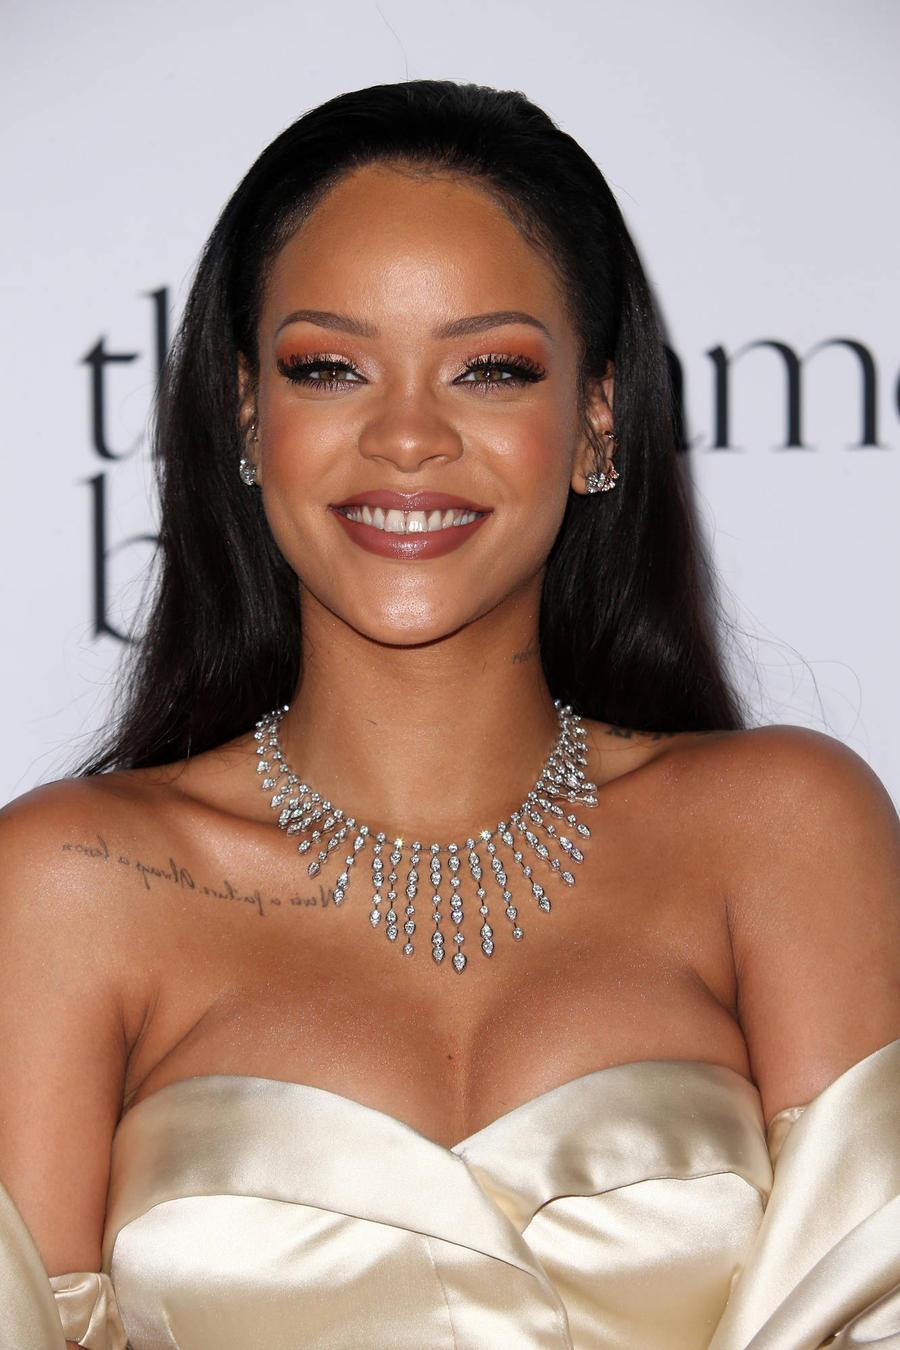 Rihanna Wanted To Make Dad Proud With Namesake Puma Collection